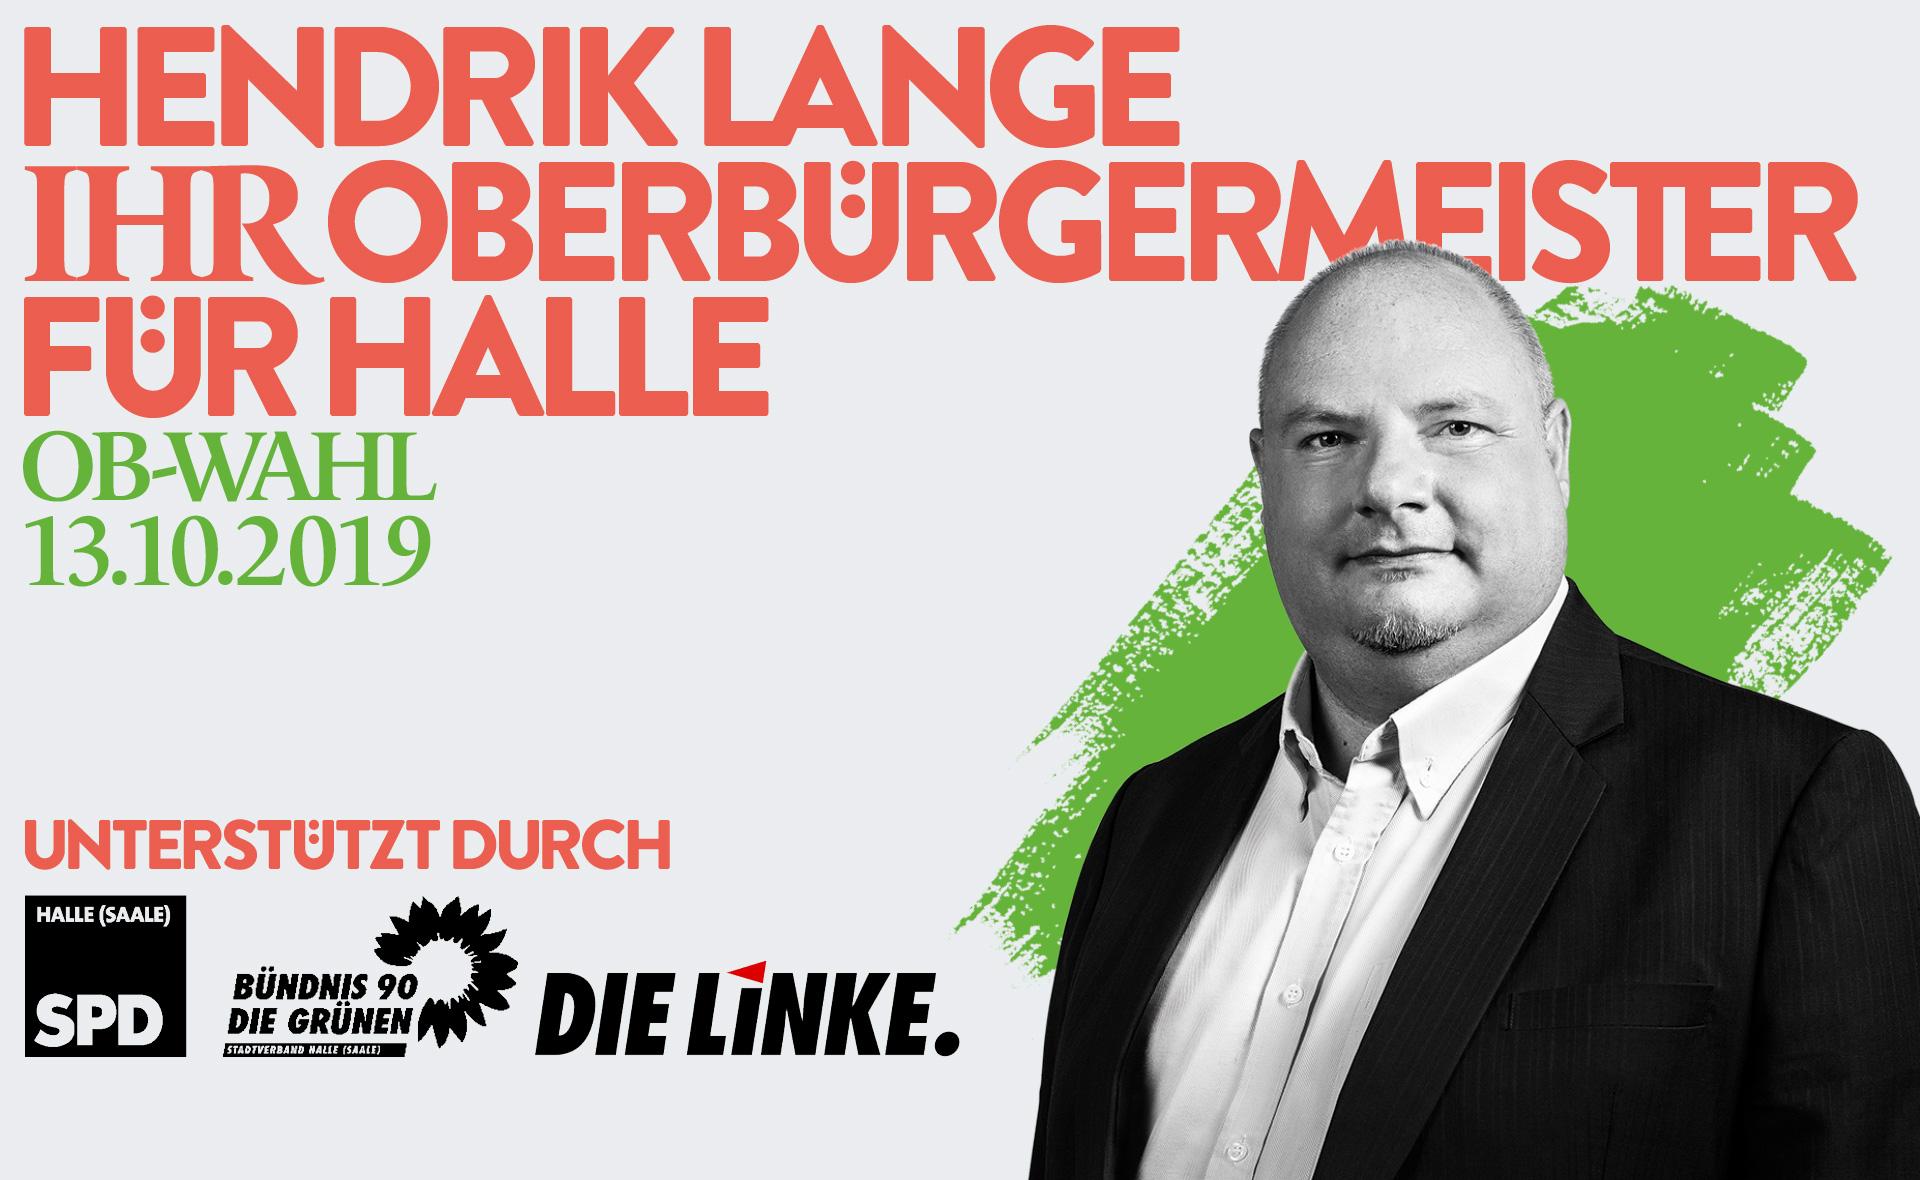 Hendrik Lange